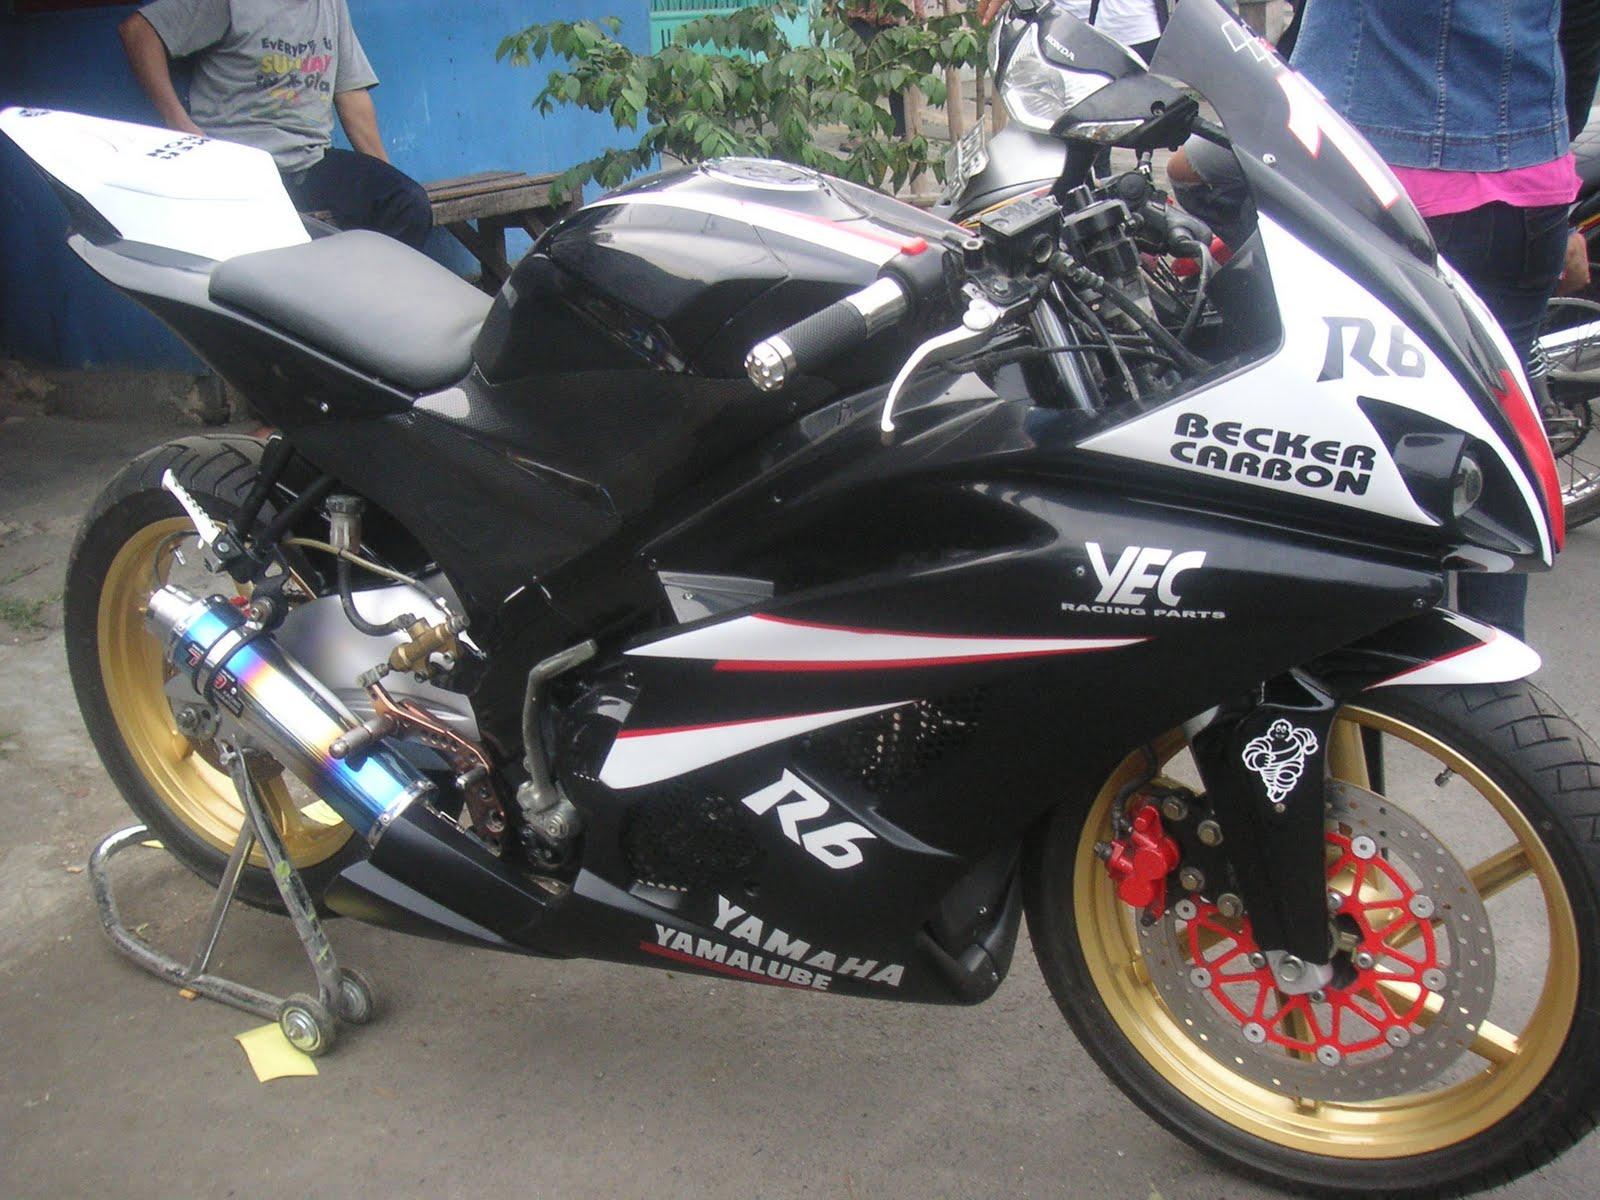 Modif Stang Jepit Yamaha Vixion